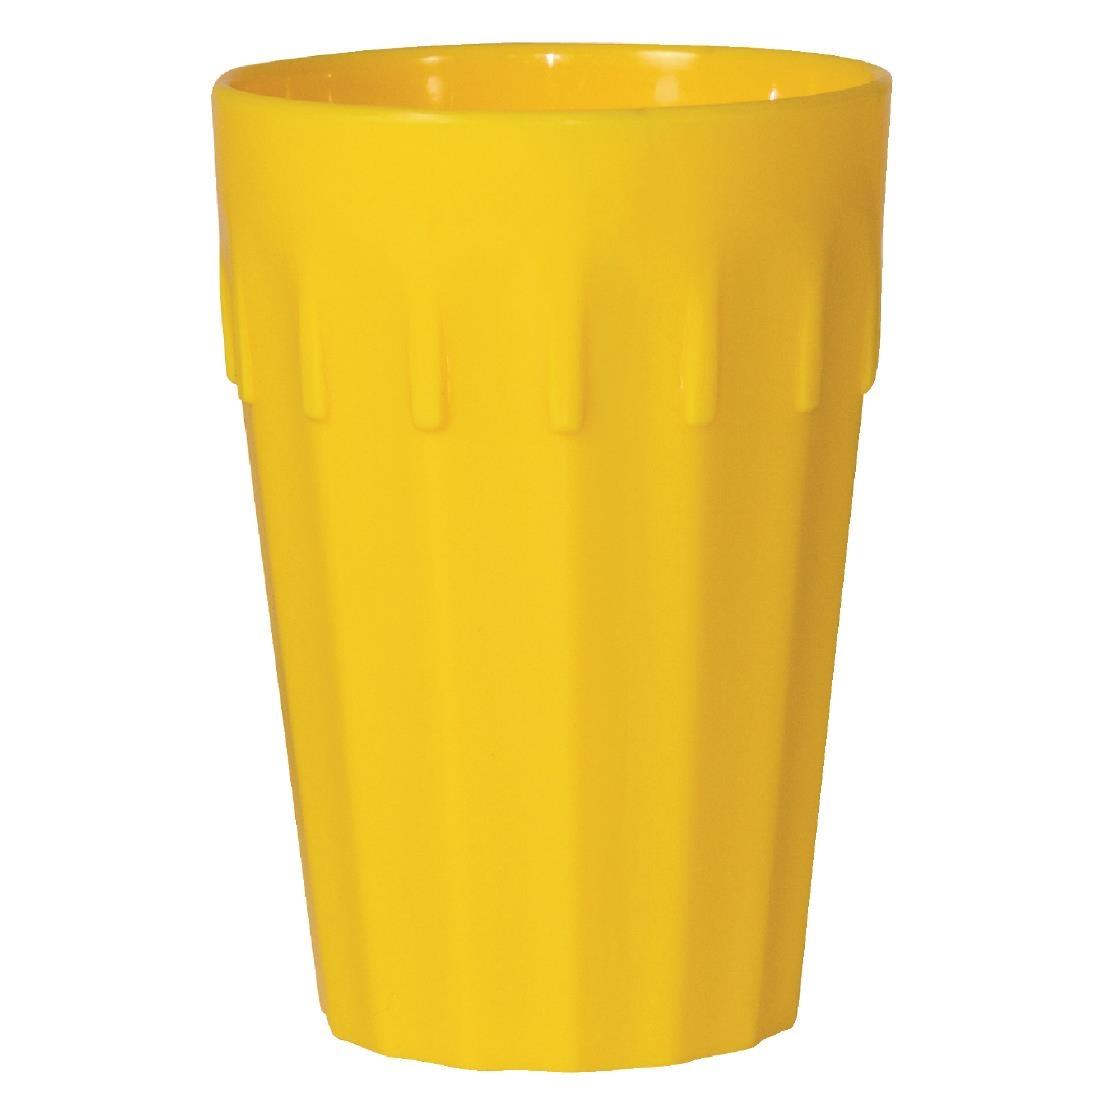 Tumbler - Yellow